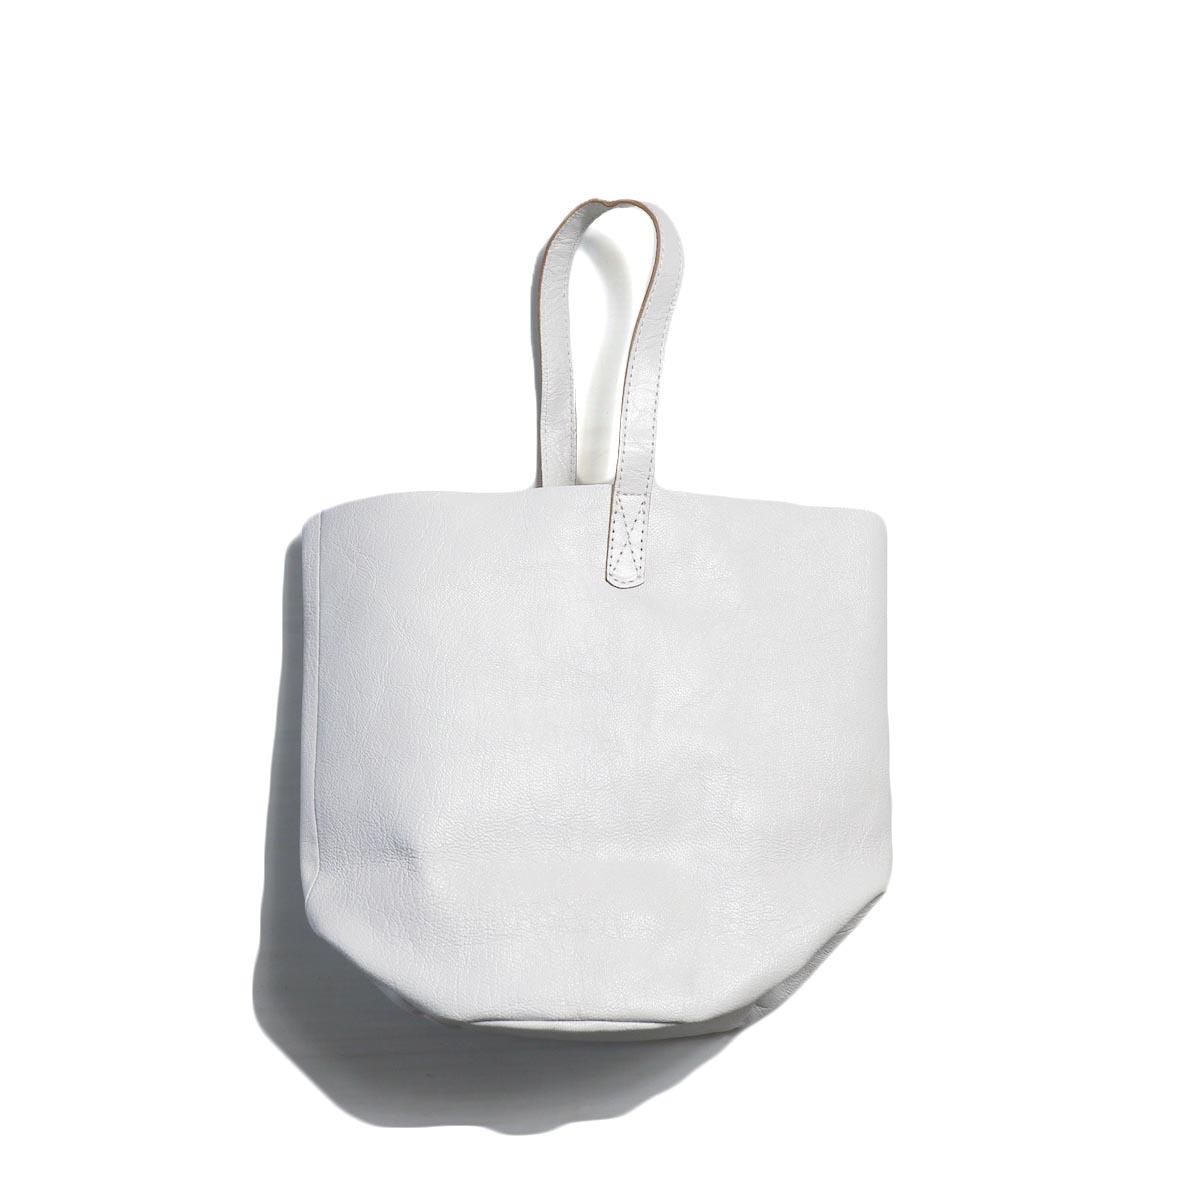 MASTER & Co. / GOAT ONE HANDLE BAG -WHITE